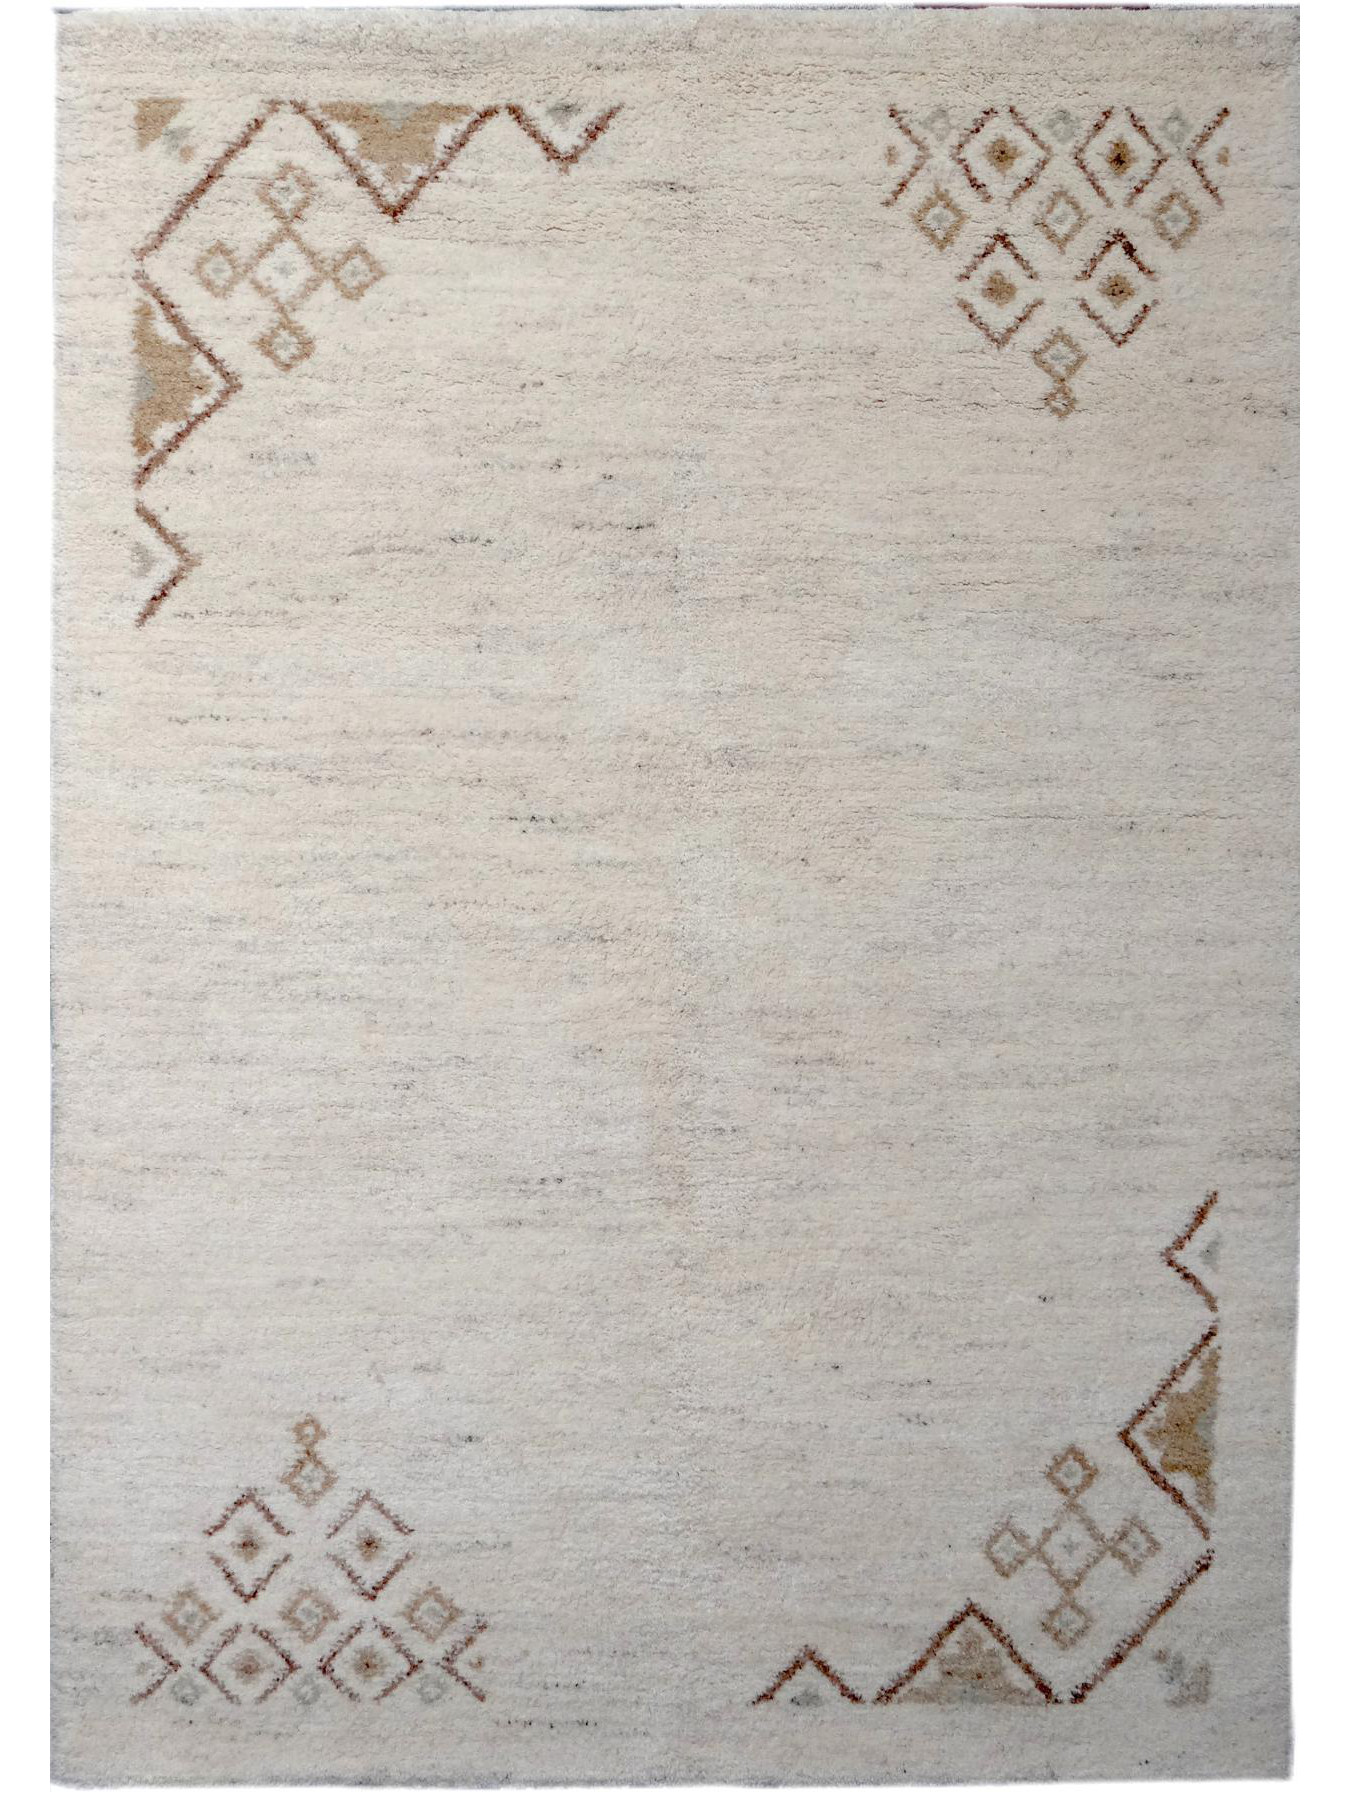 Berber rugs - ATLAS 2 - 221